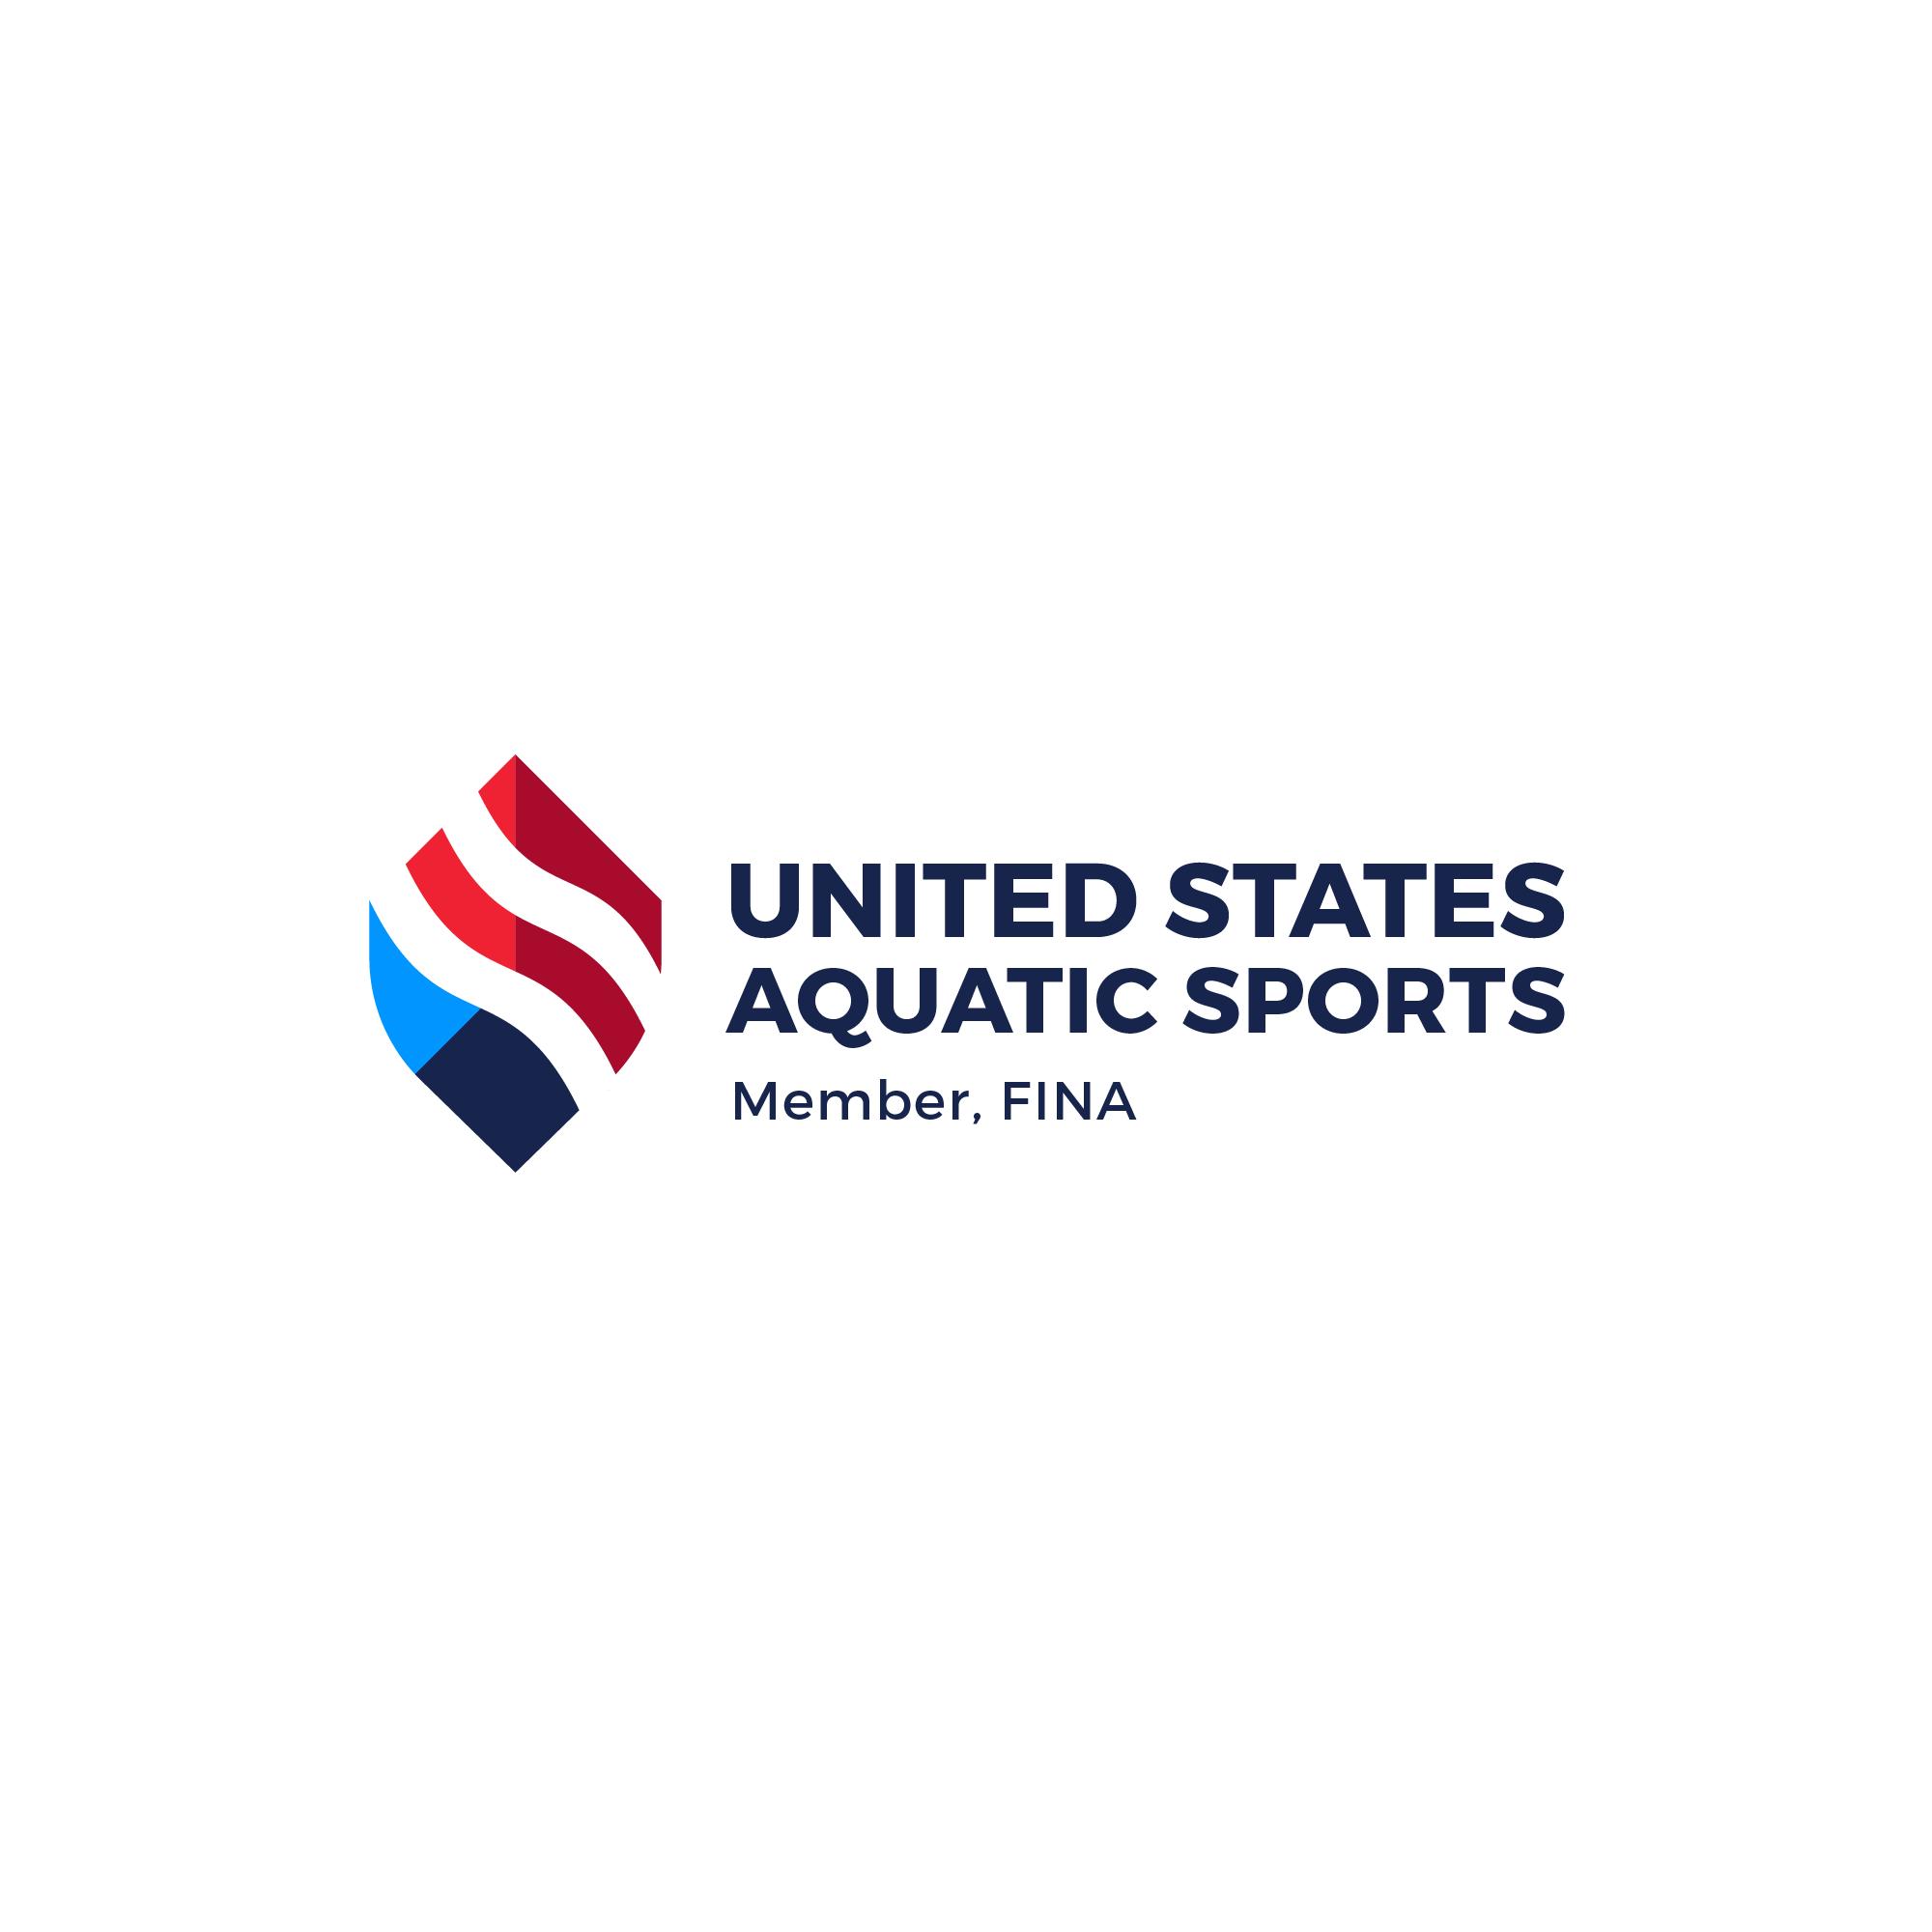 United States Aquatic Sports Logo